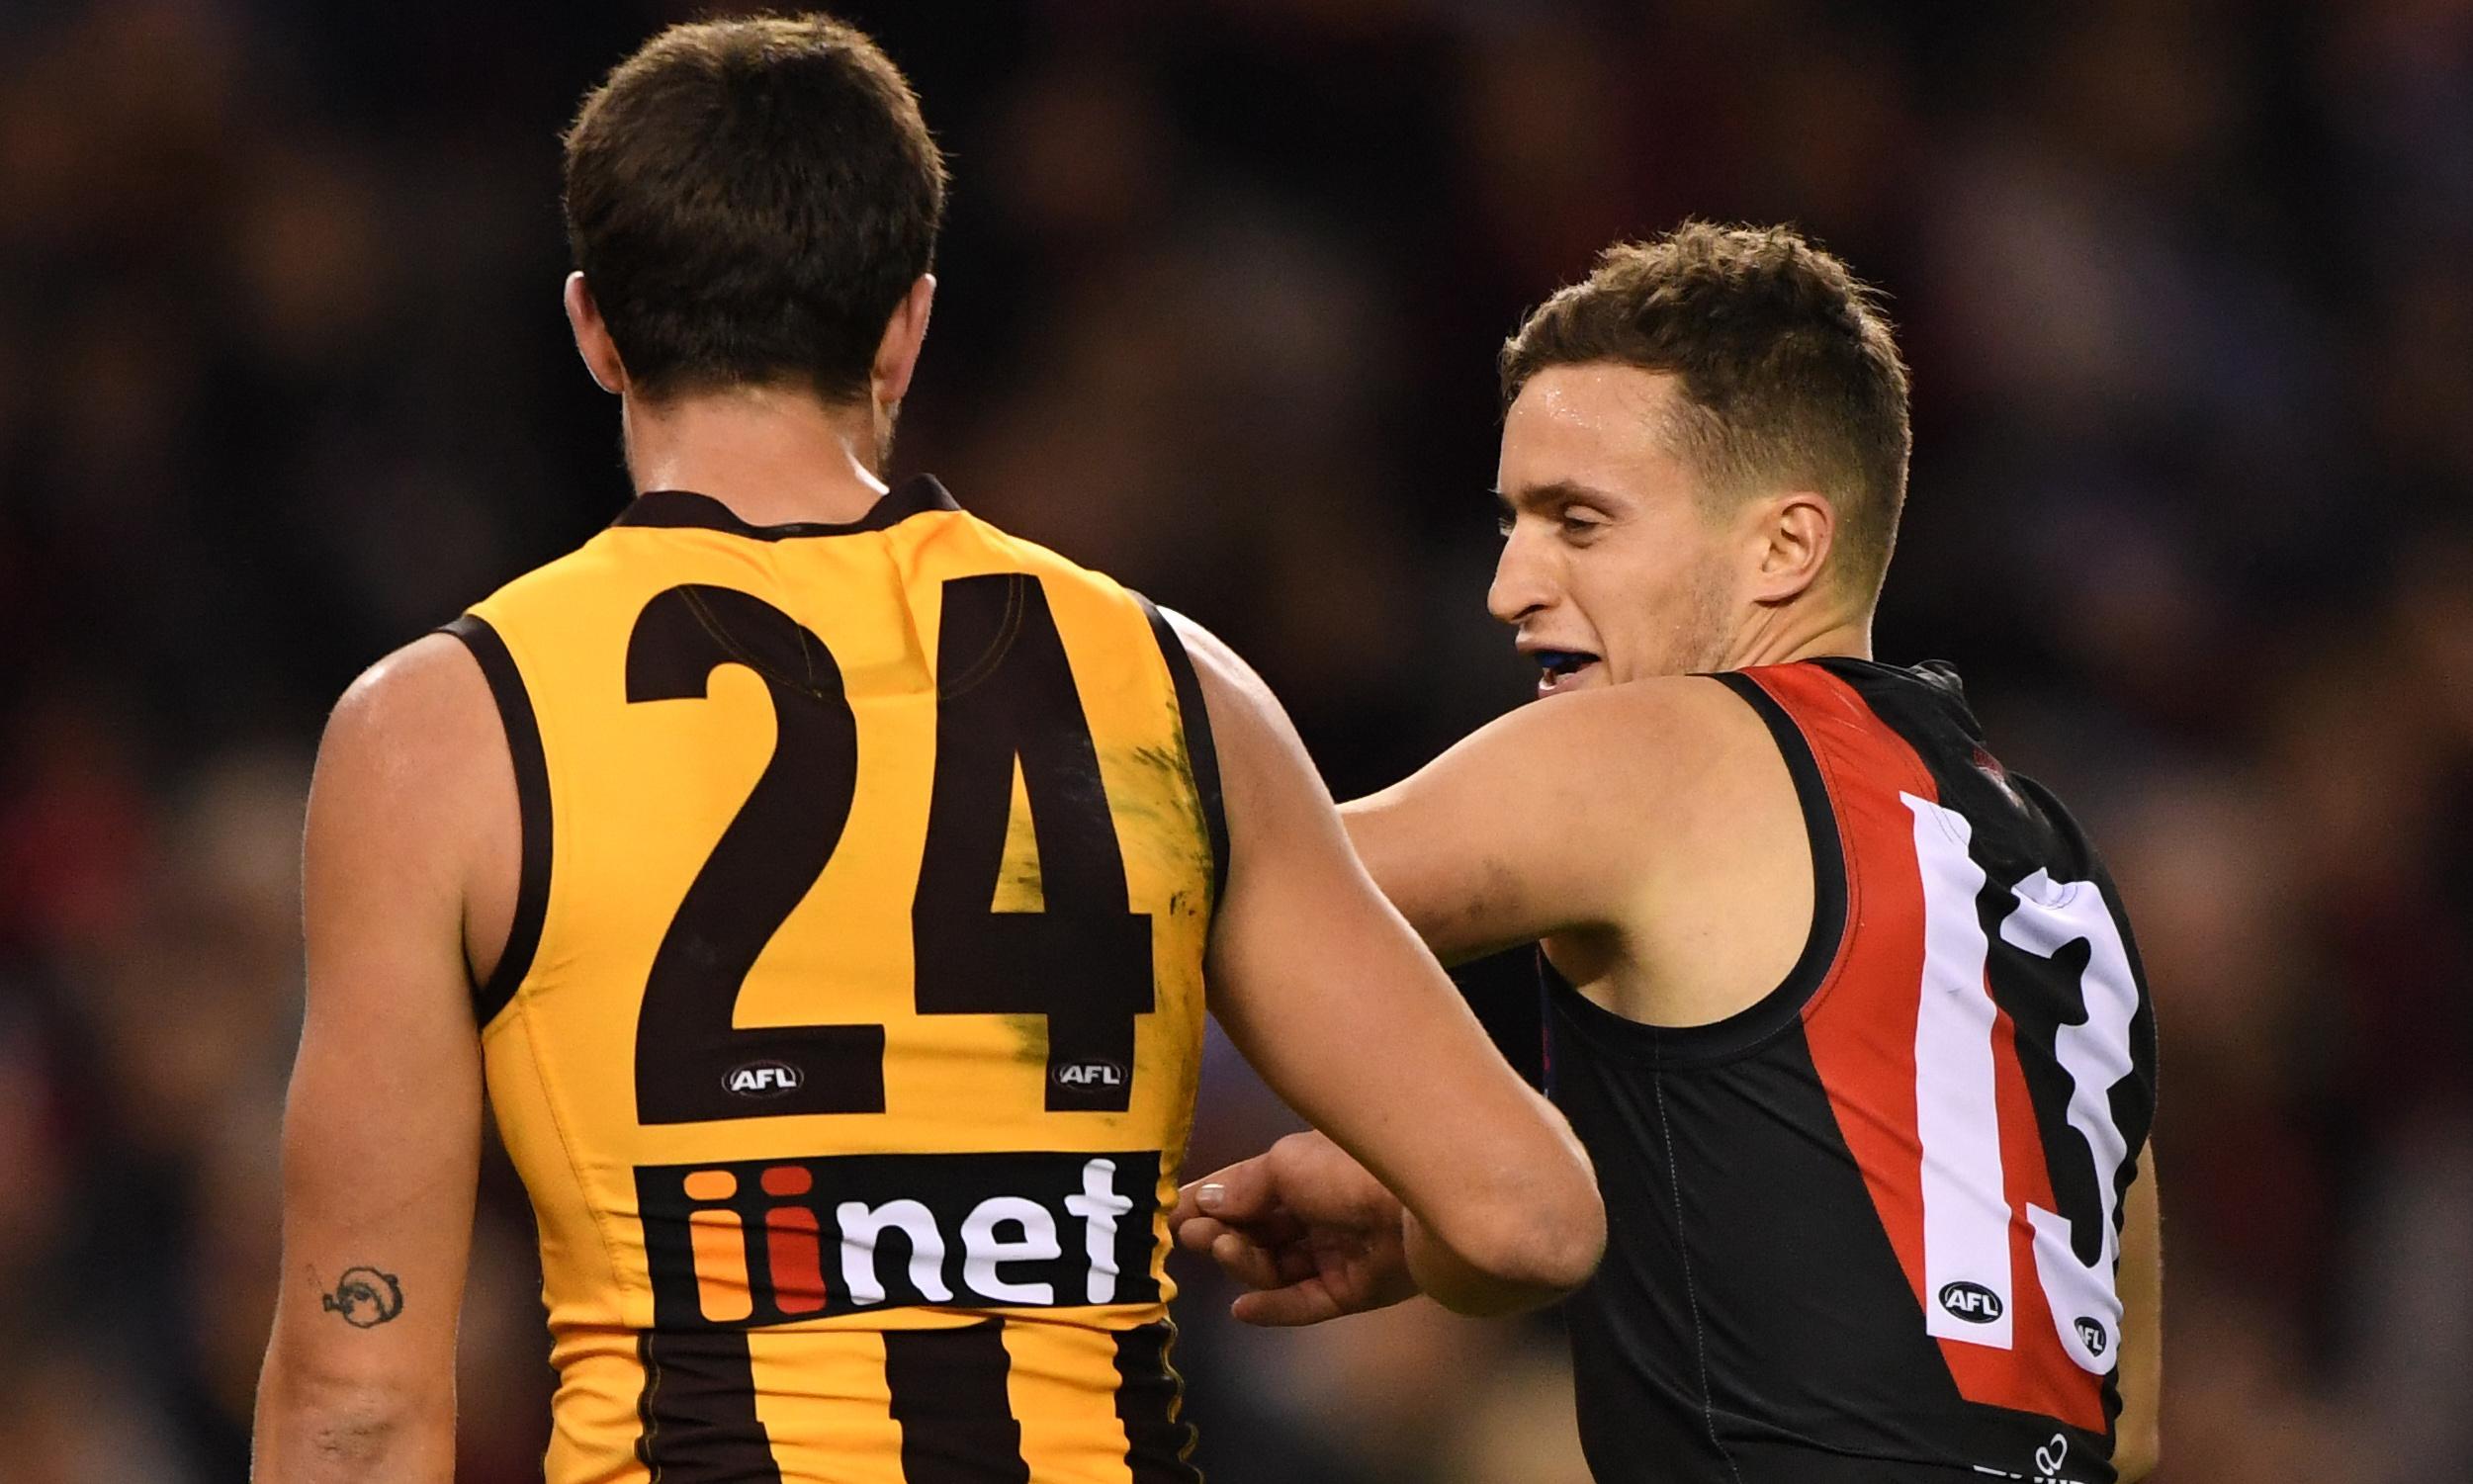 Orazio Fantasia feels the pinch as Stratton's schoolyard tactics raise AFL eyebrows